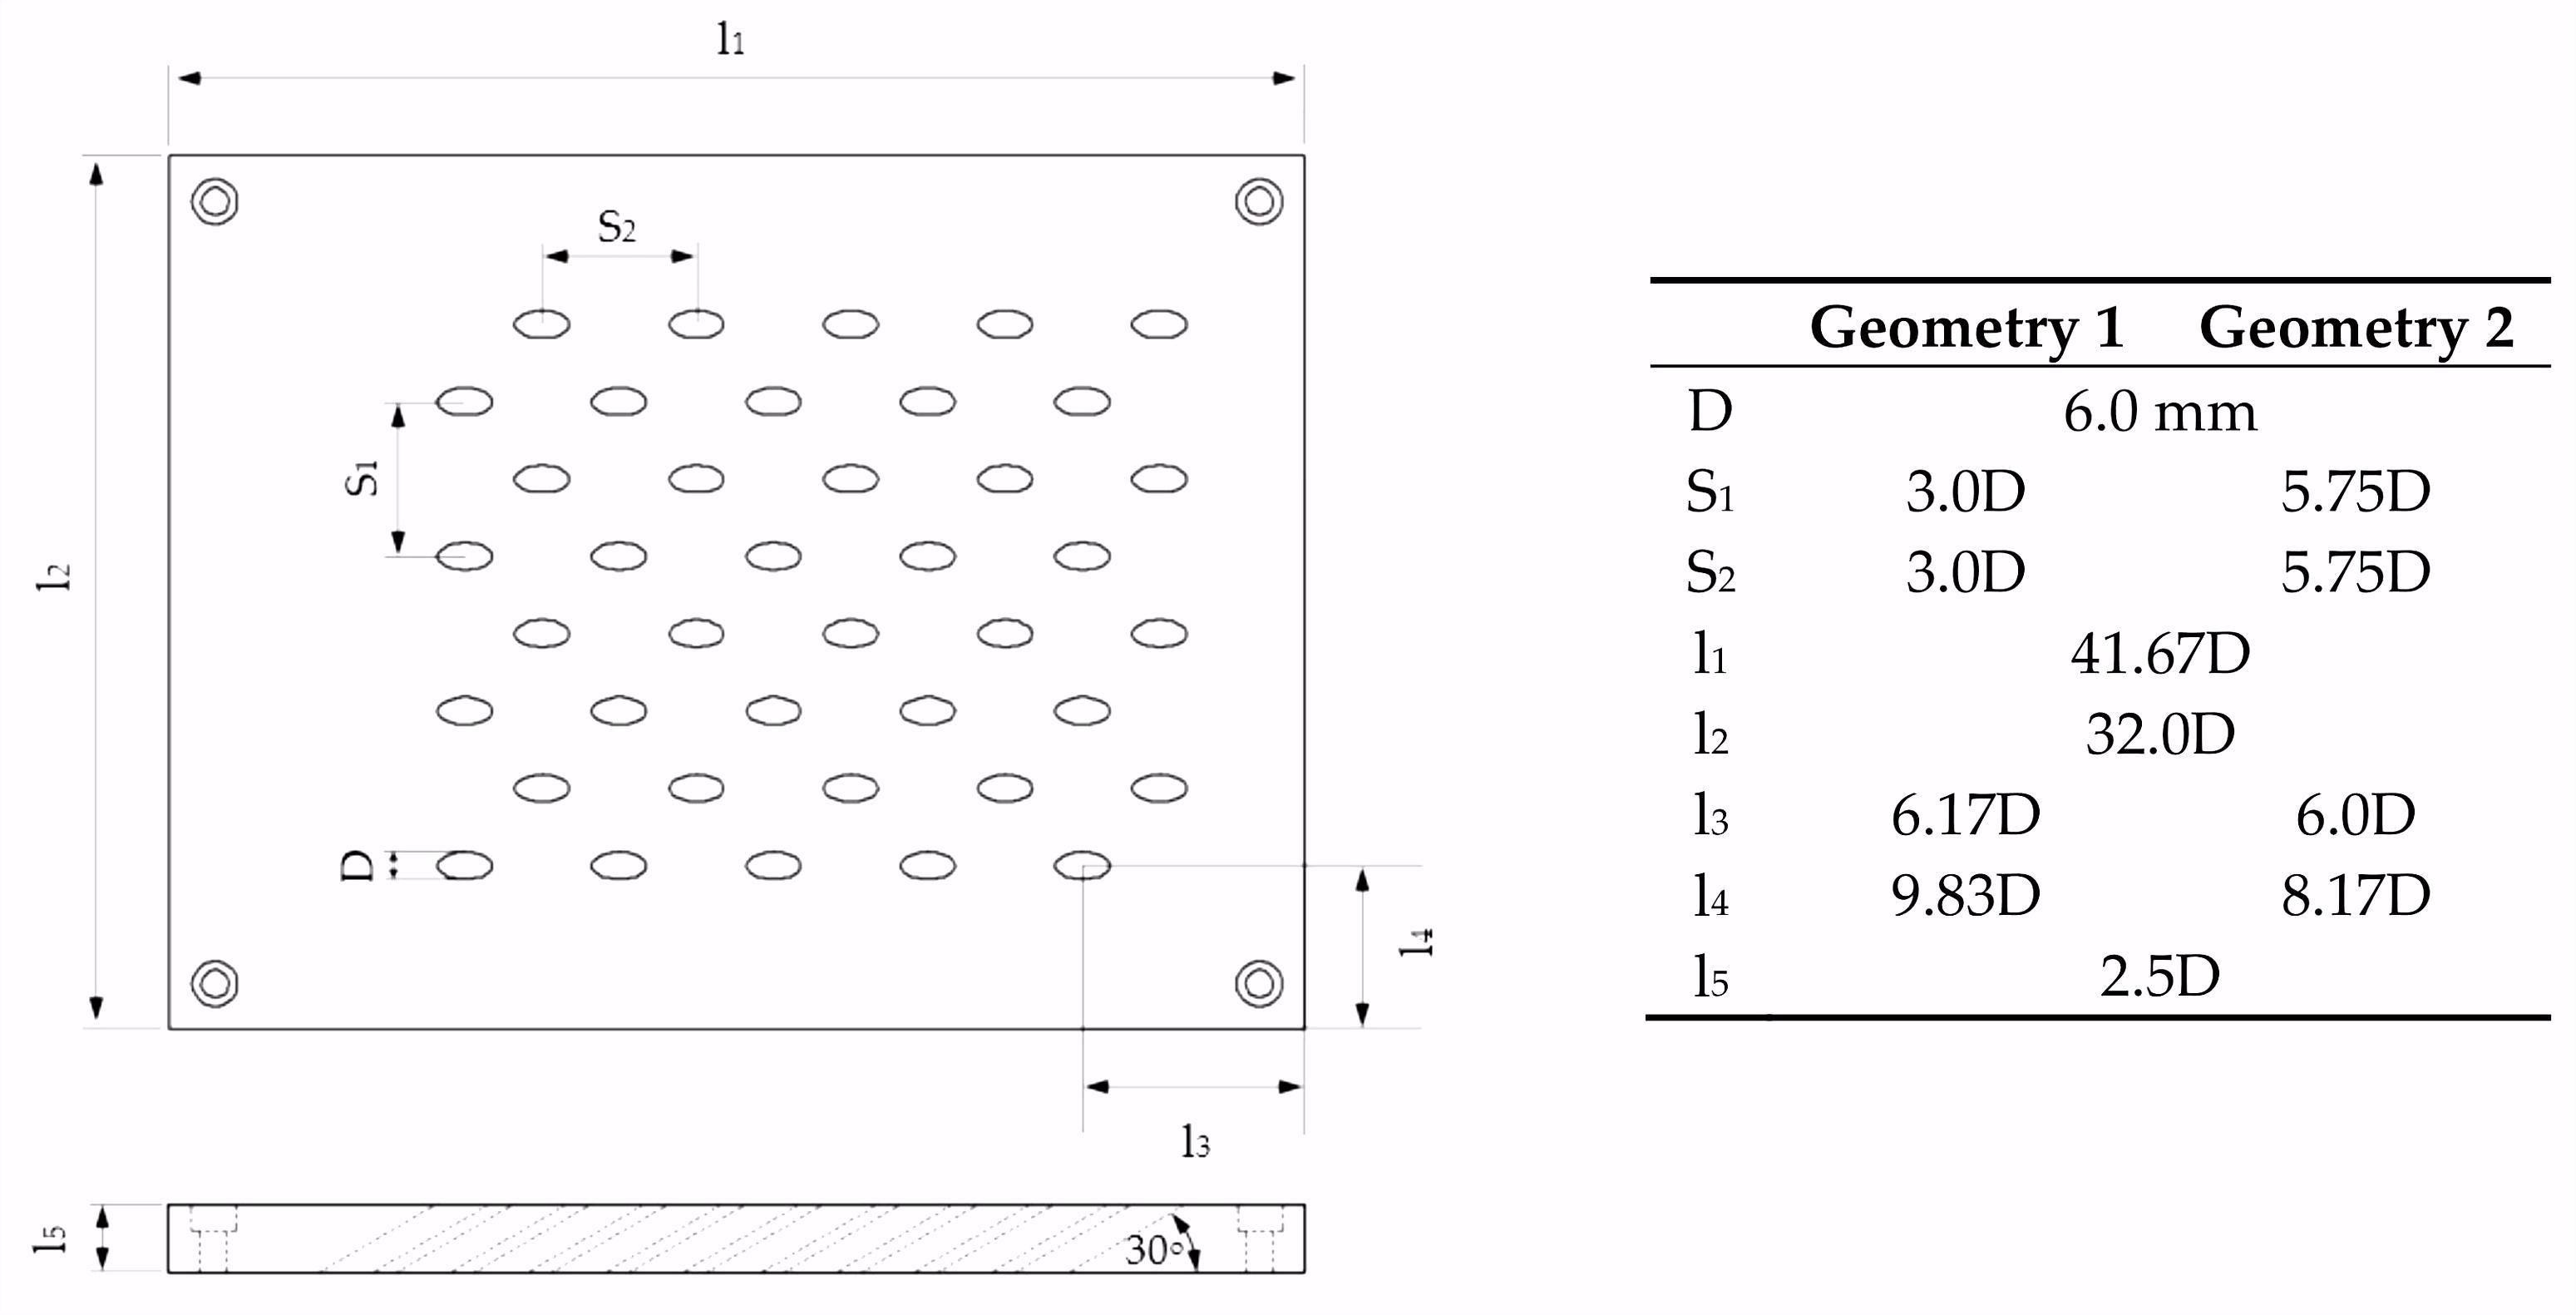 Liquiditätsplanung Excel Oder Vermeer Bp714 Manual Ebook